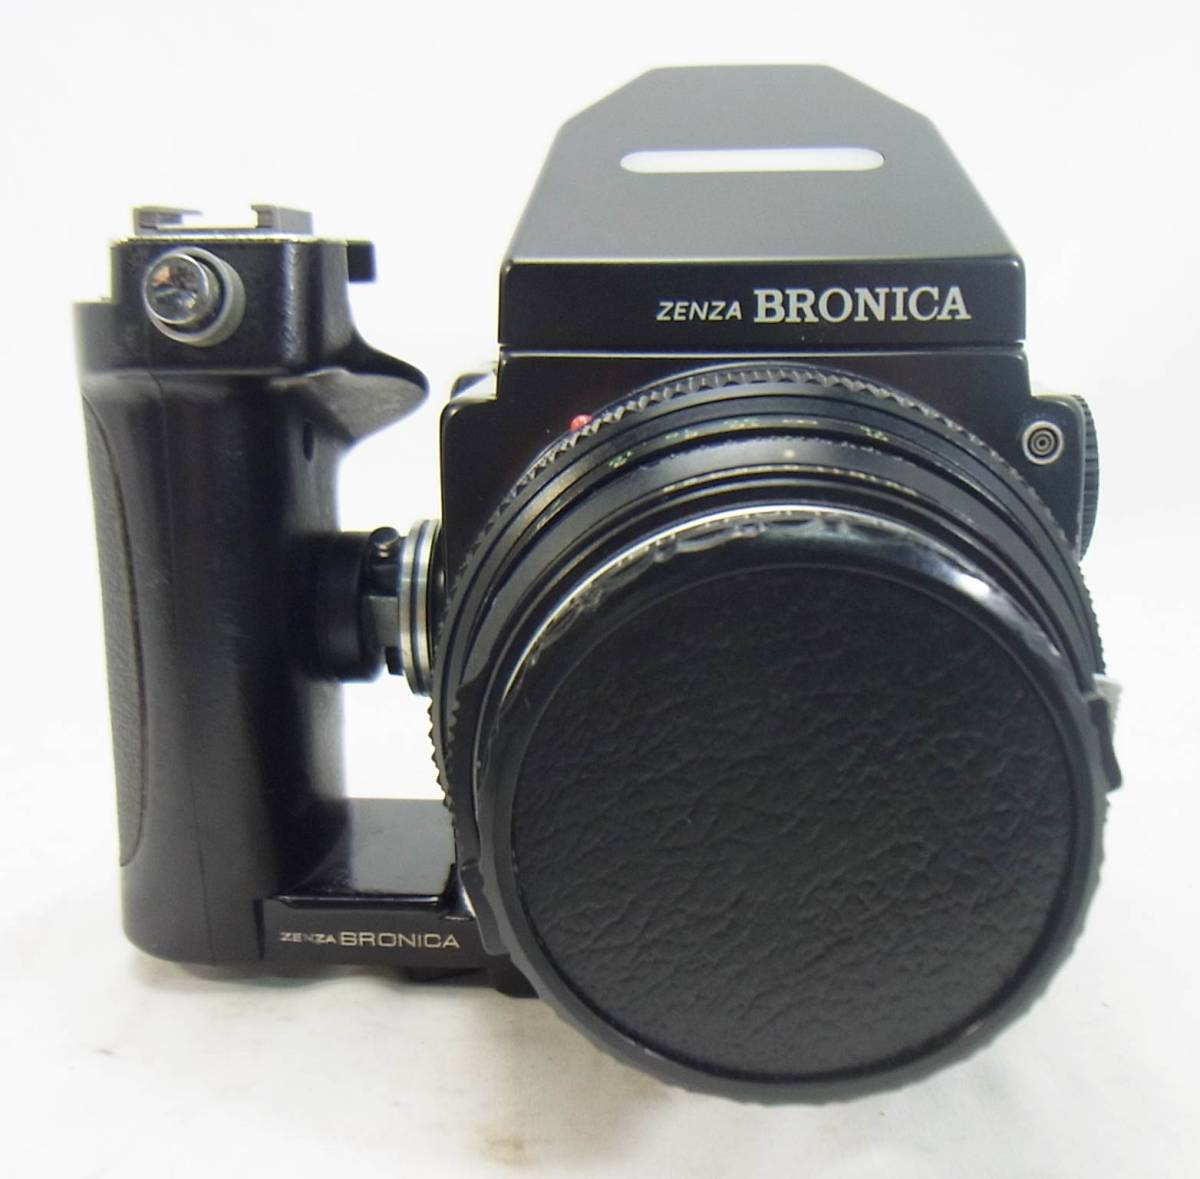 【ZENZA】ゼンザ☆BRONICA/ブロニカ☆ETR Si☆ZENZANON MC 1:2.8 f=75mm_画像7